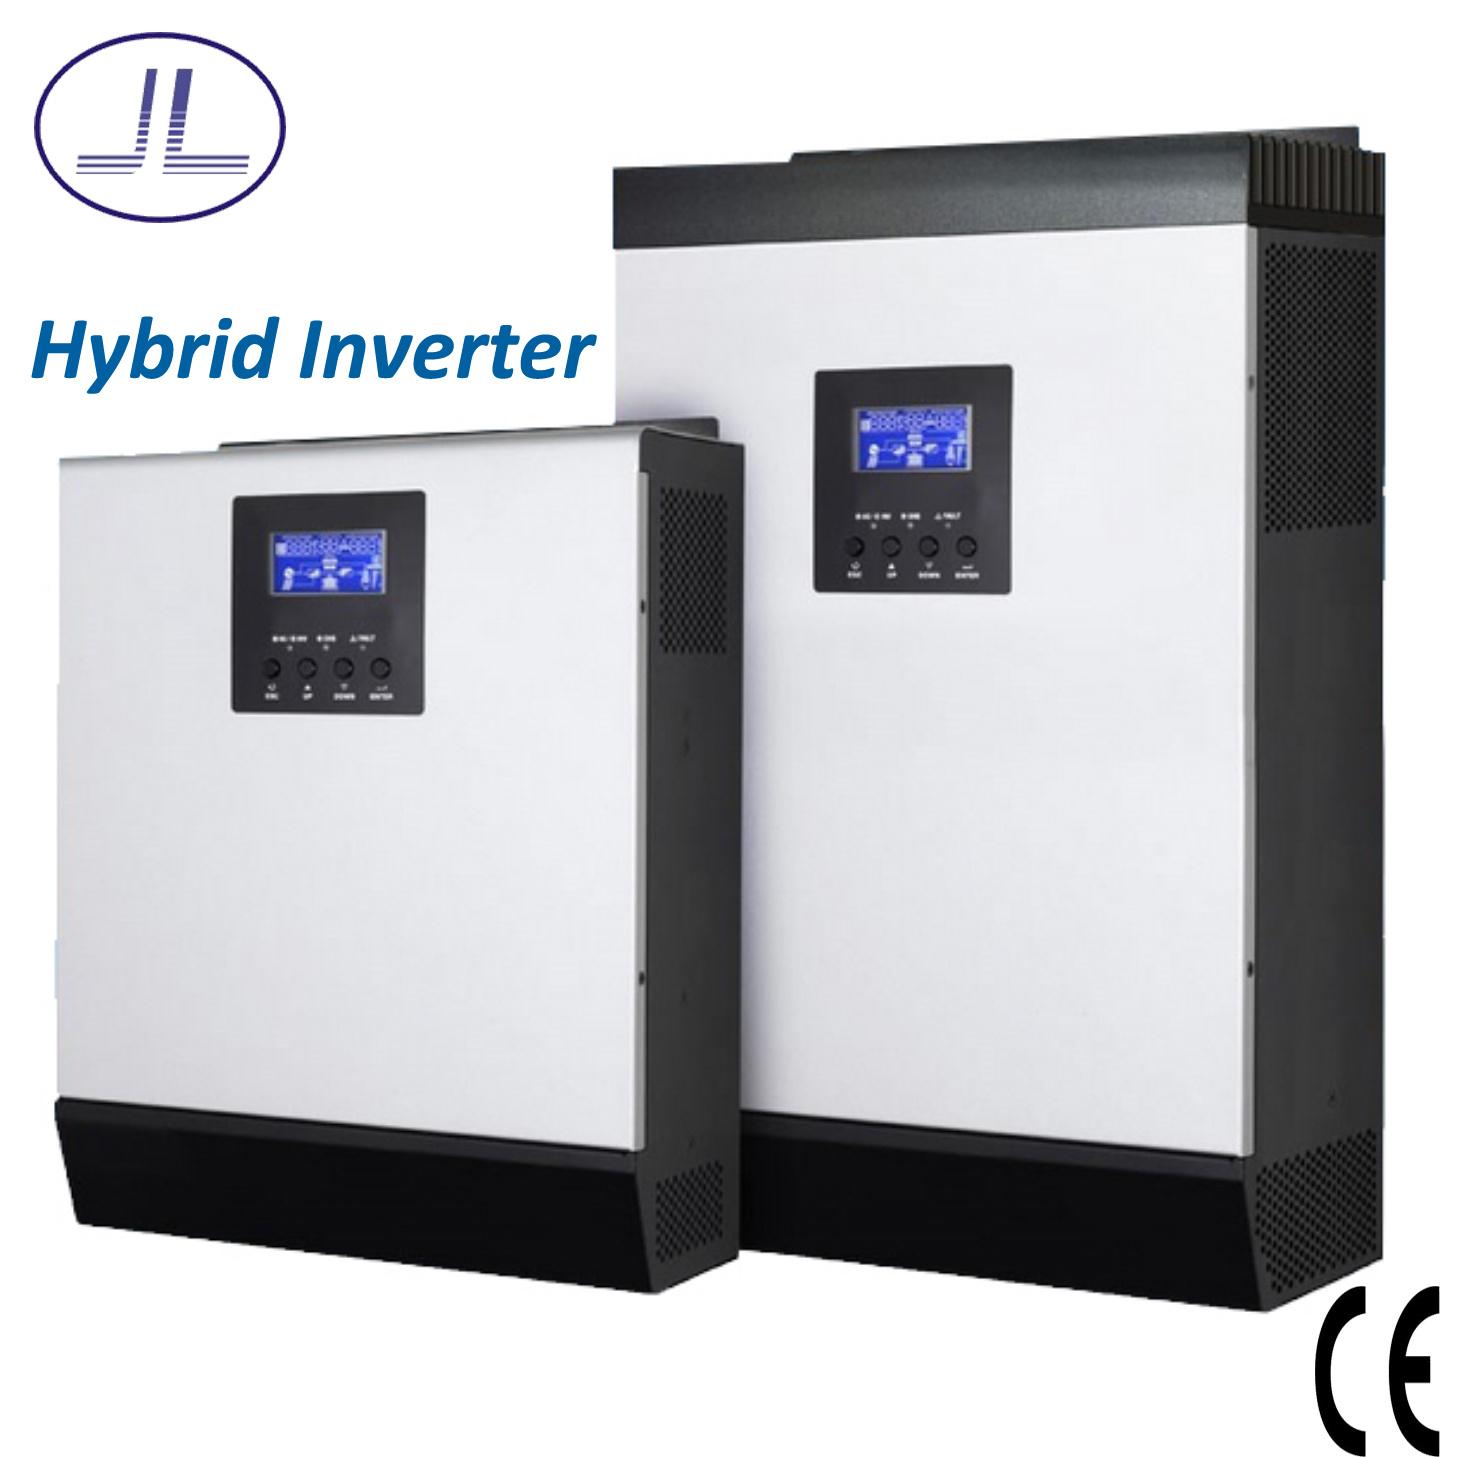 2.4kw Multi-Function Inverter/MPPT Solar Charger